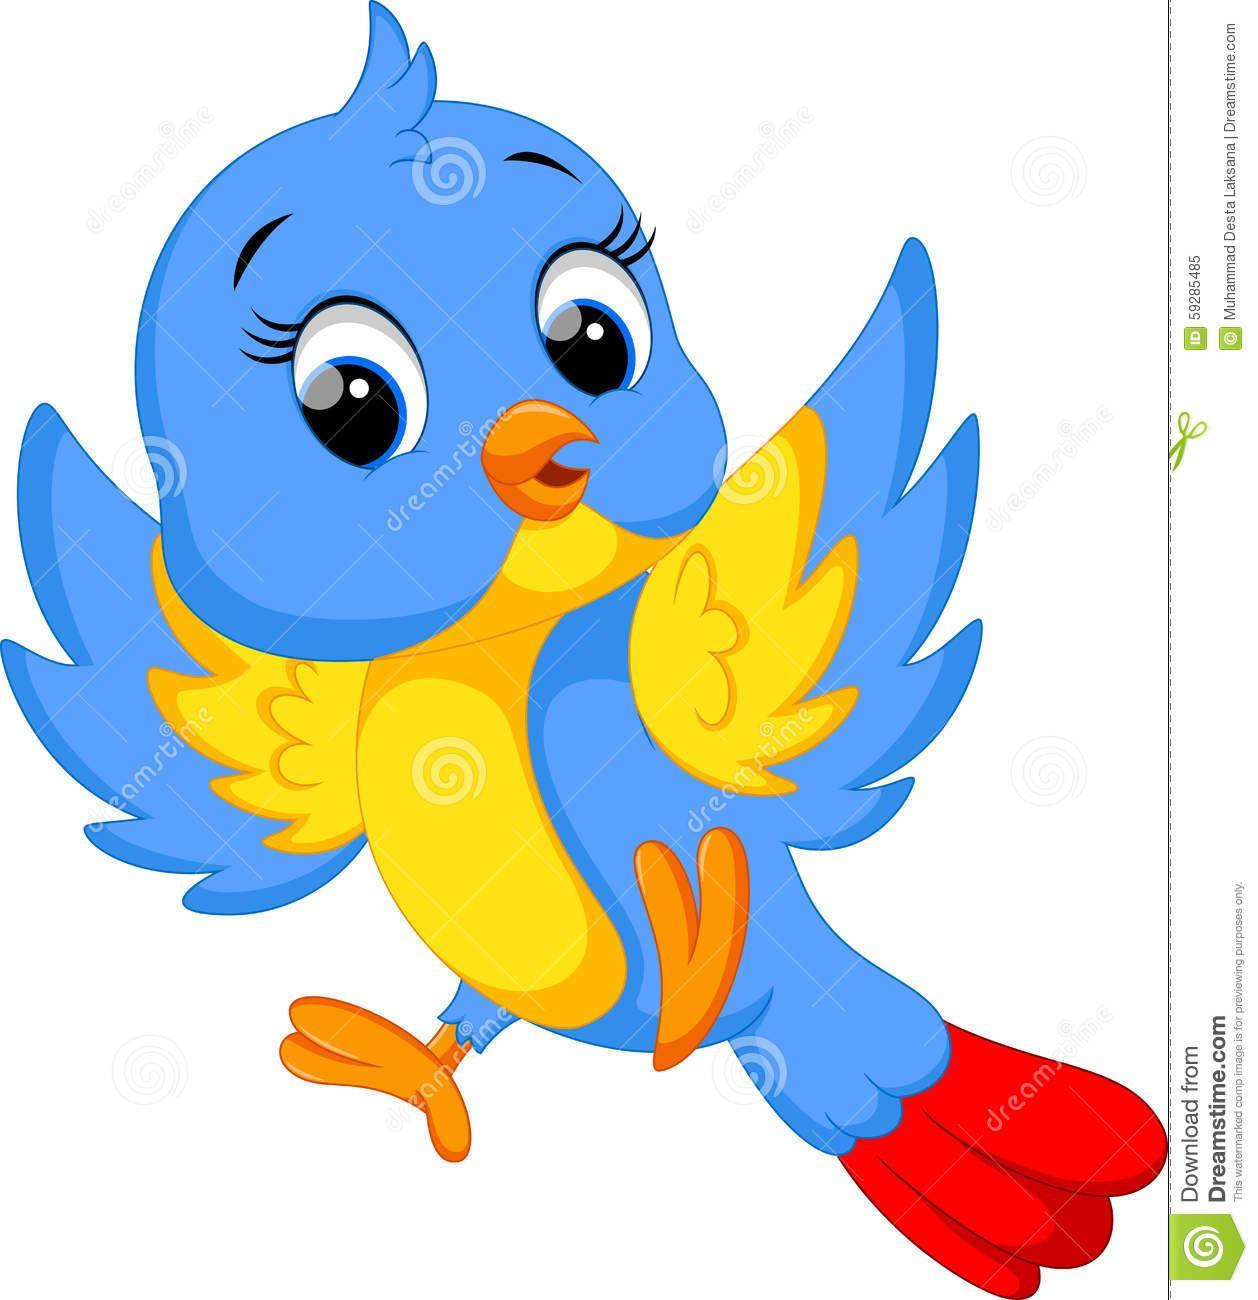 Cute bird cartoon stock illustration Image of bluebird